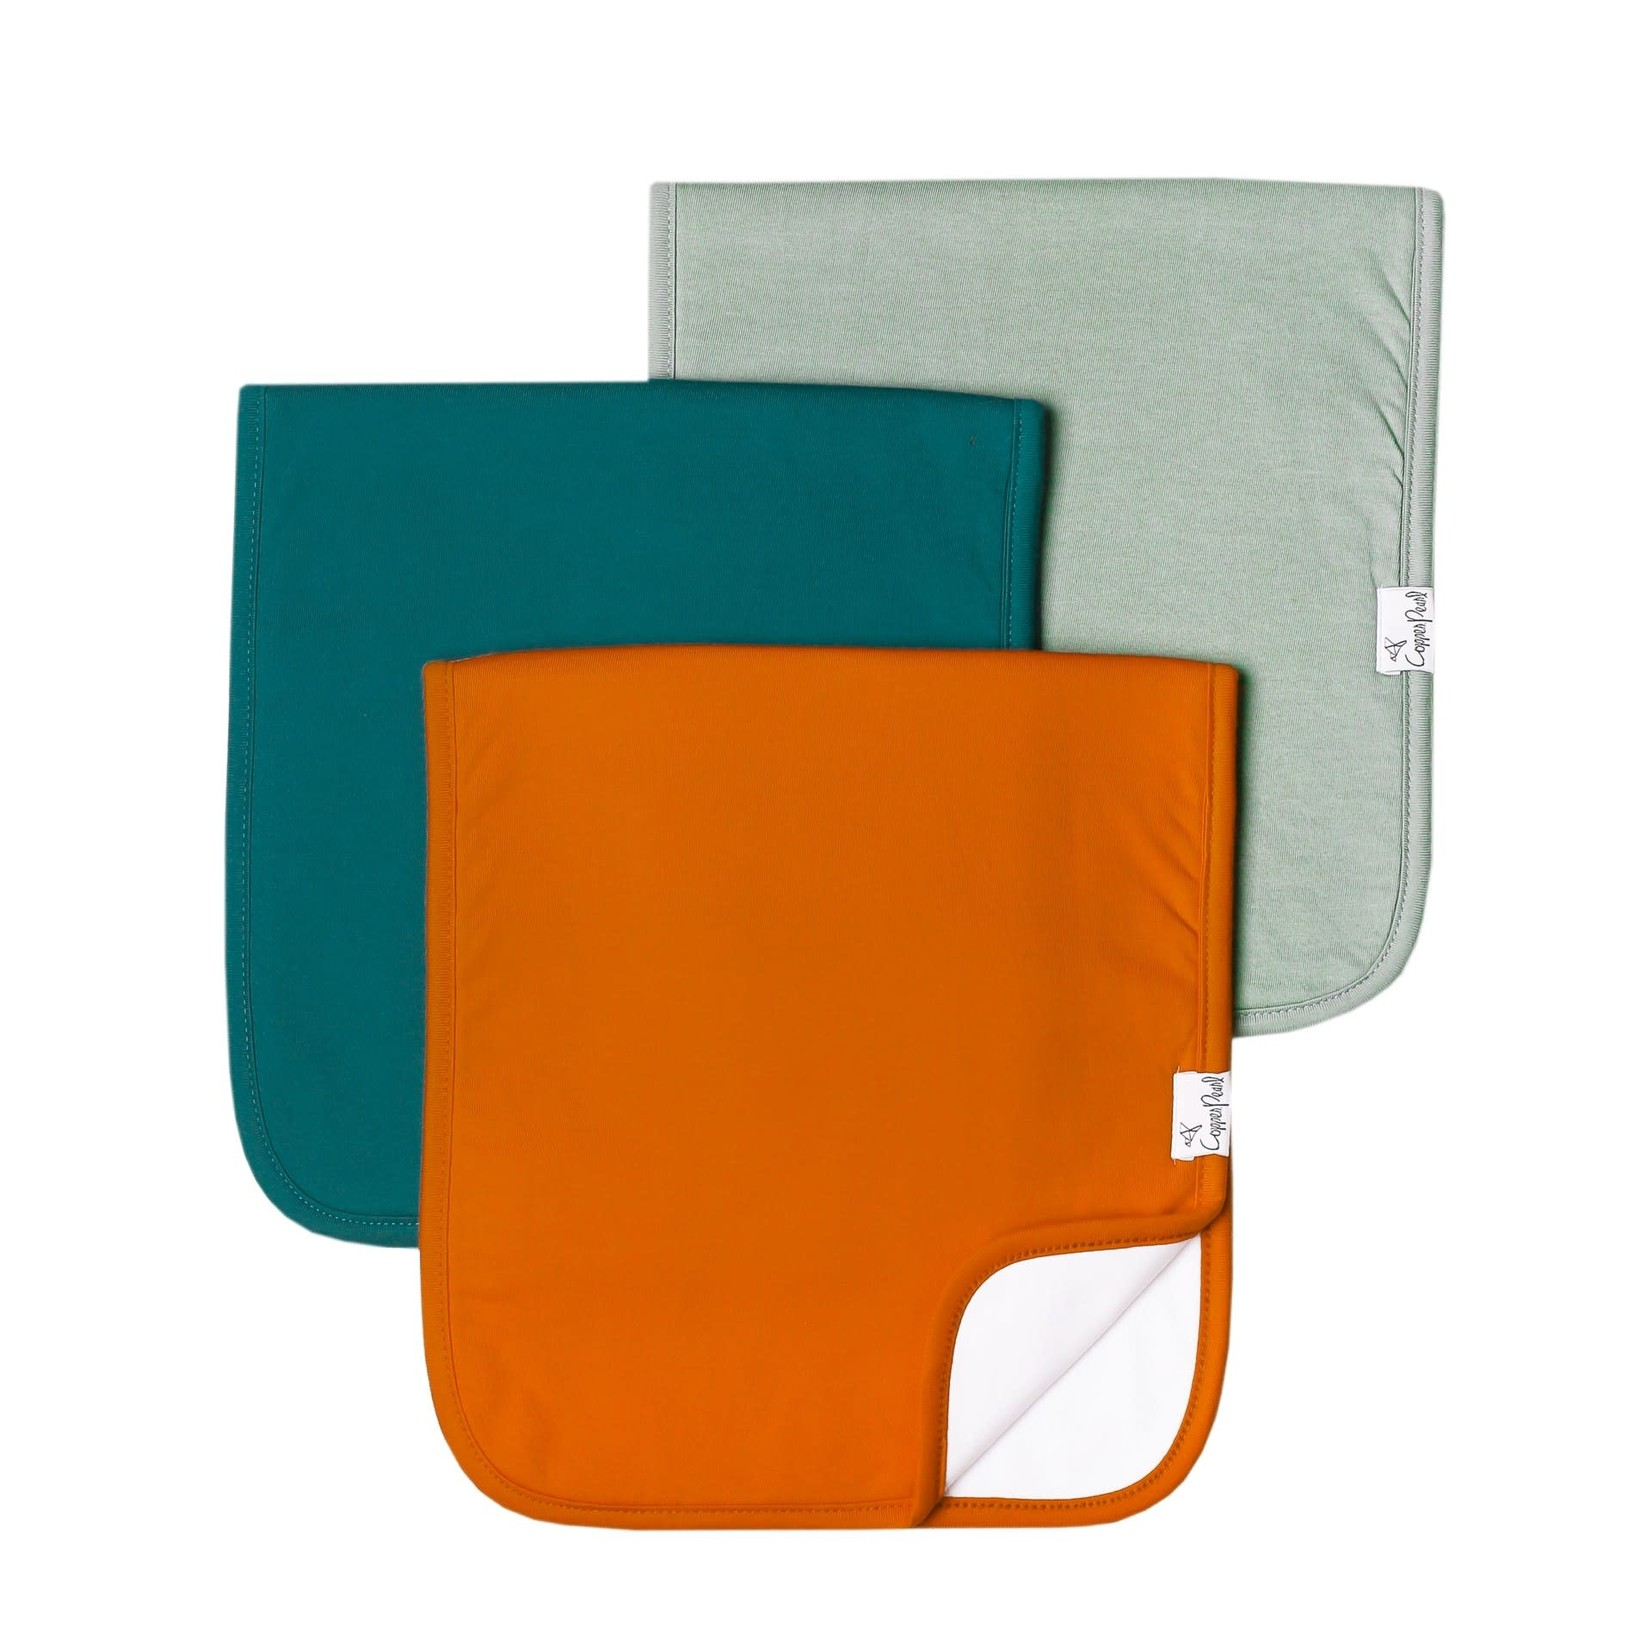 Copper Pearl Burp Cloths (3 pack) - Blaze